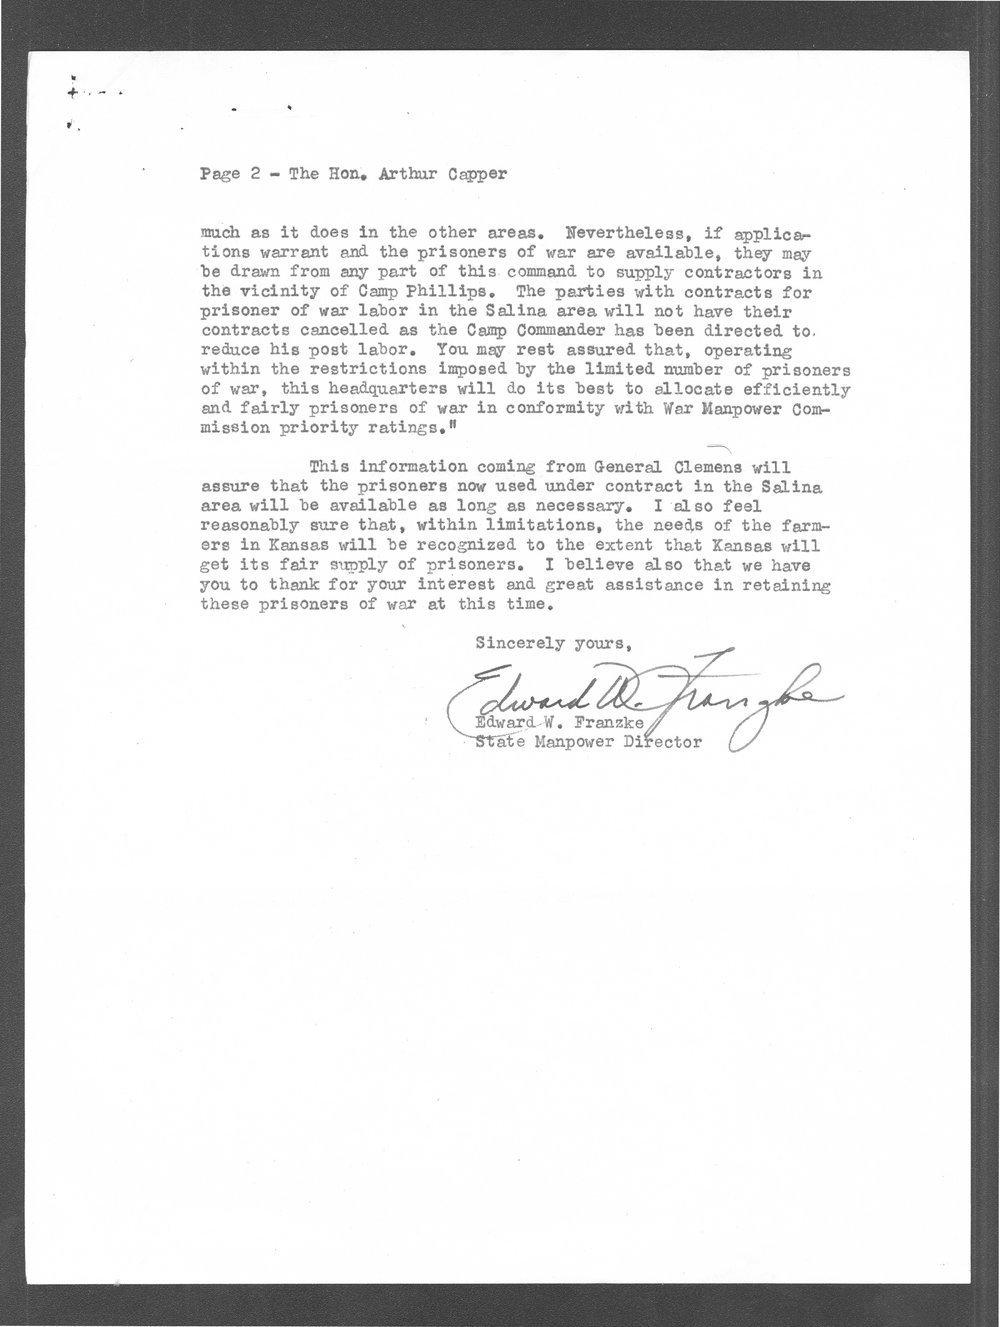 Edward Franzke to Senator Arthur Capper - 2